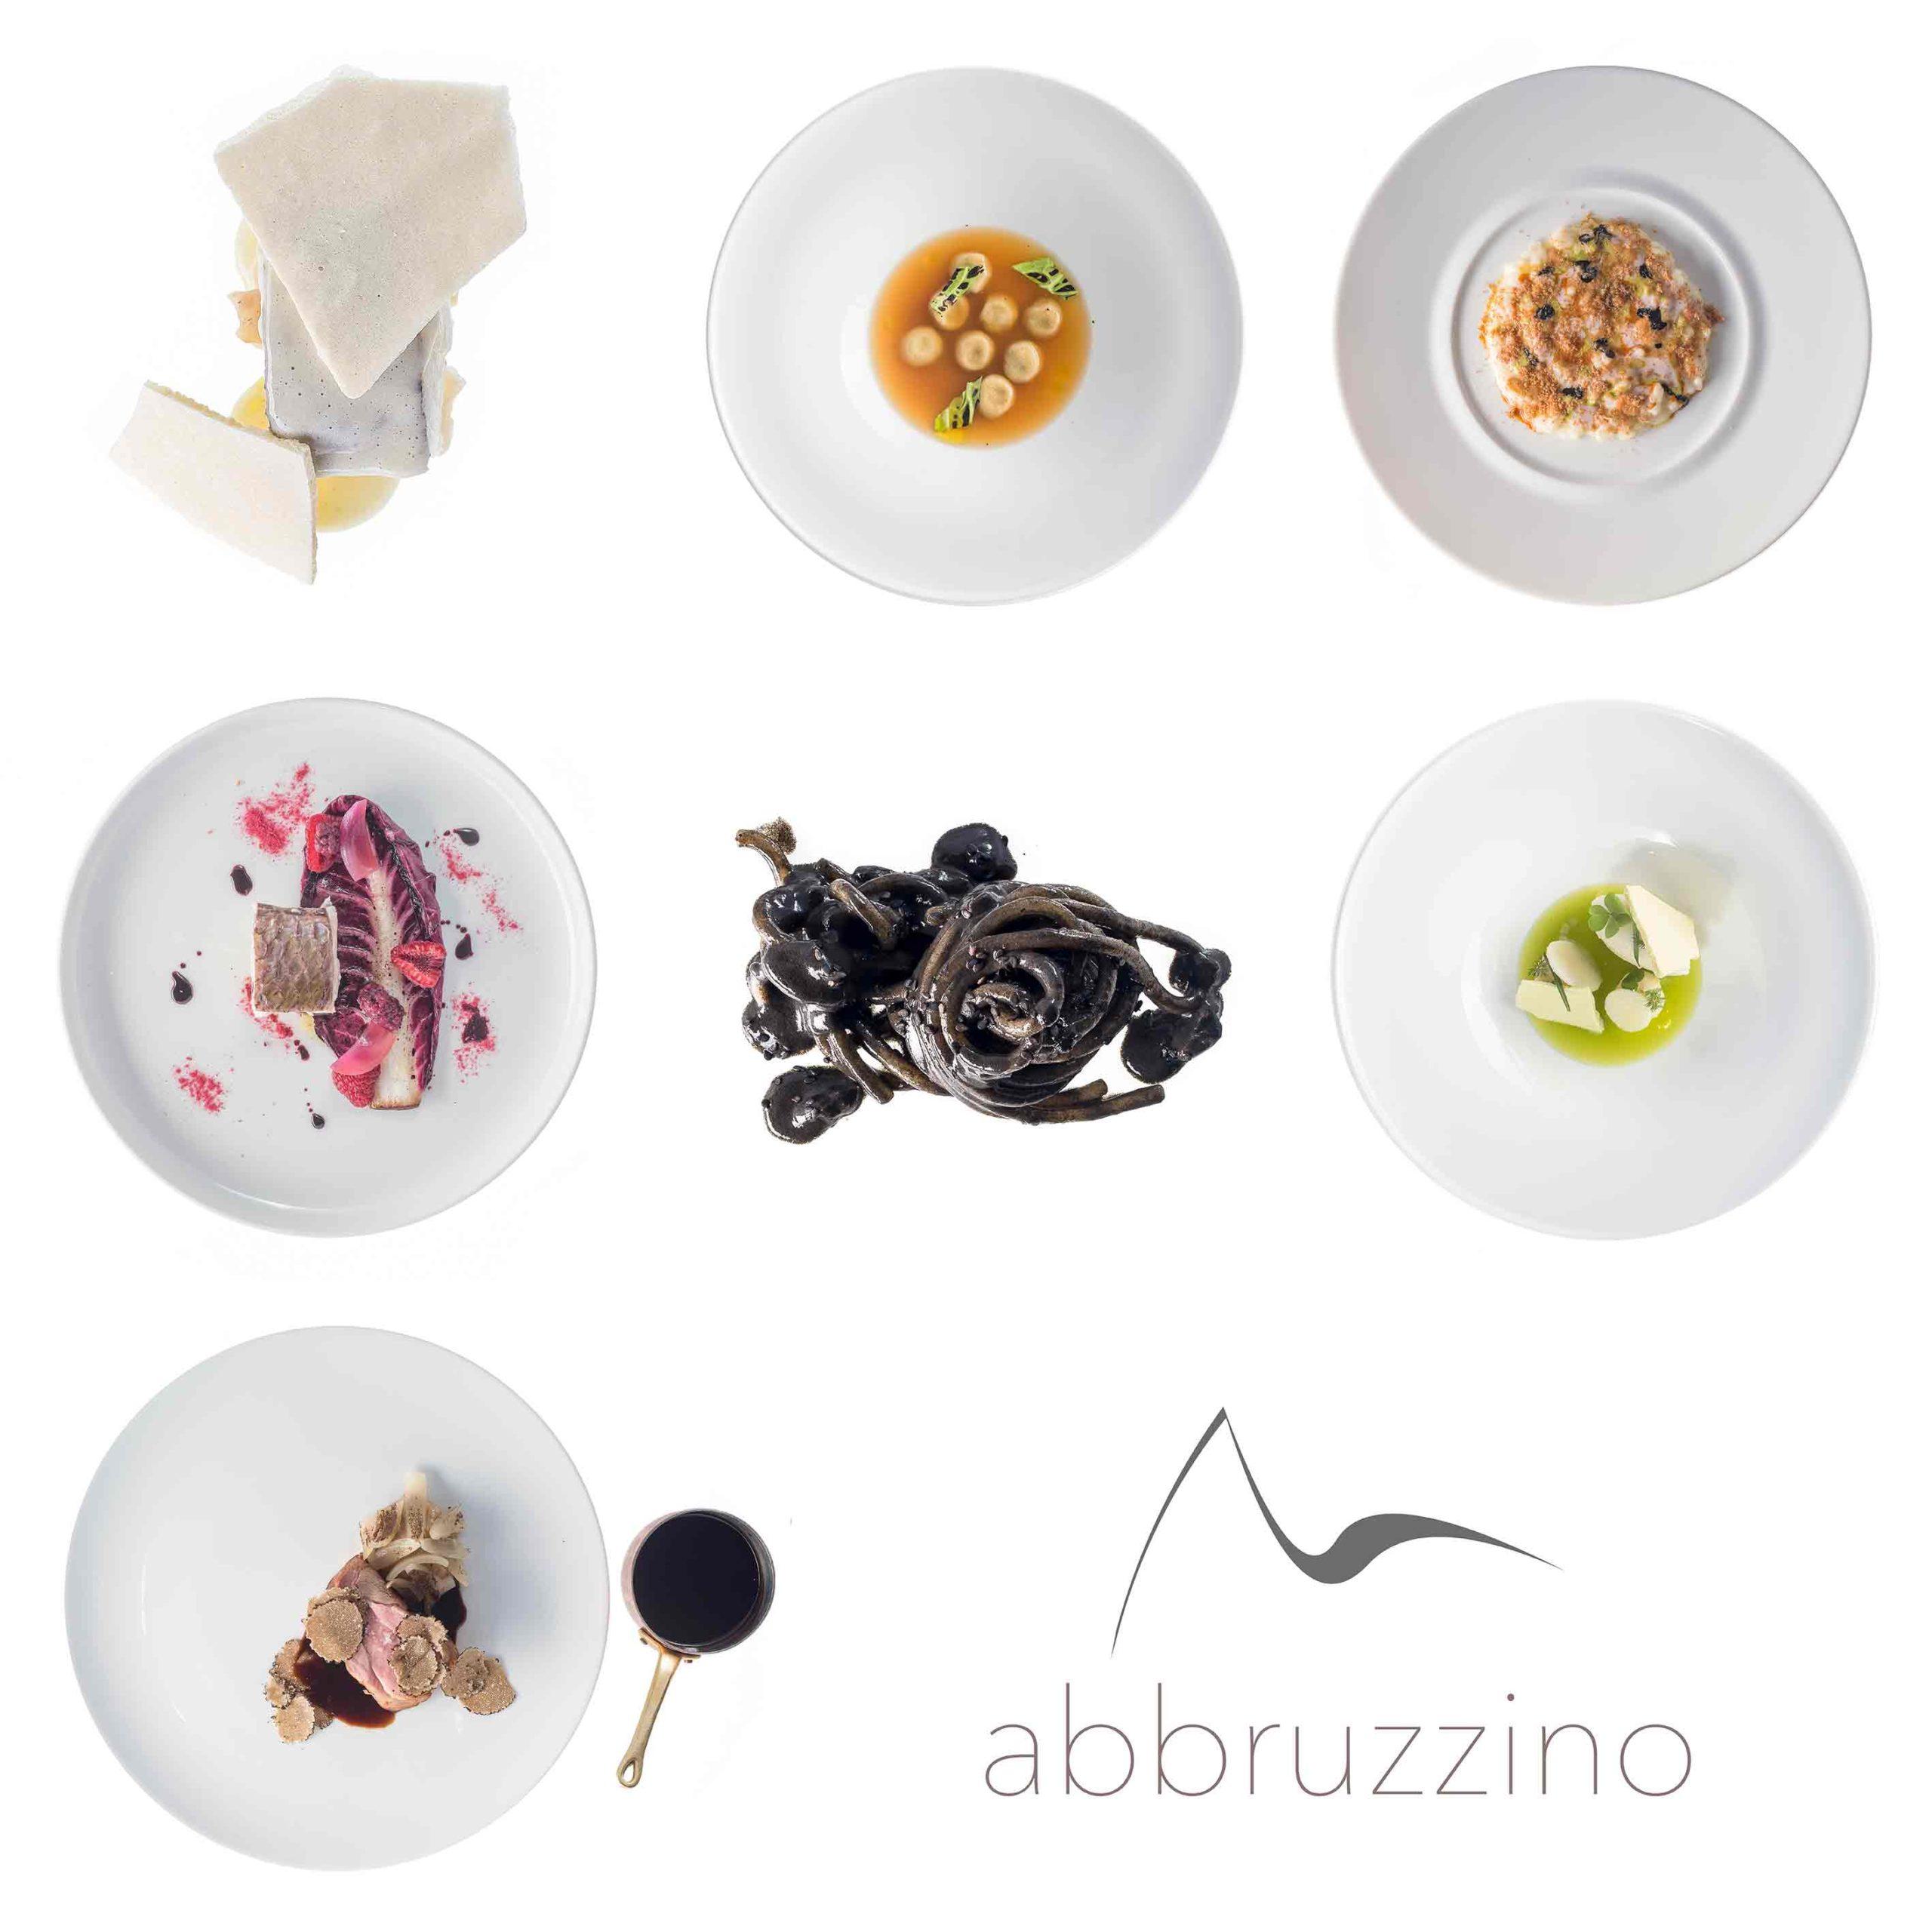 Luca Abbruzzino Chef Gabriele Tolisano